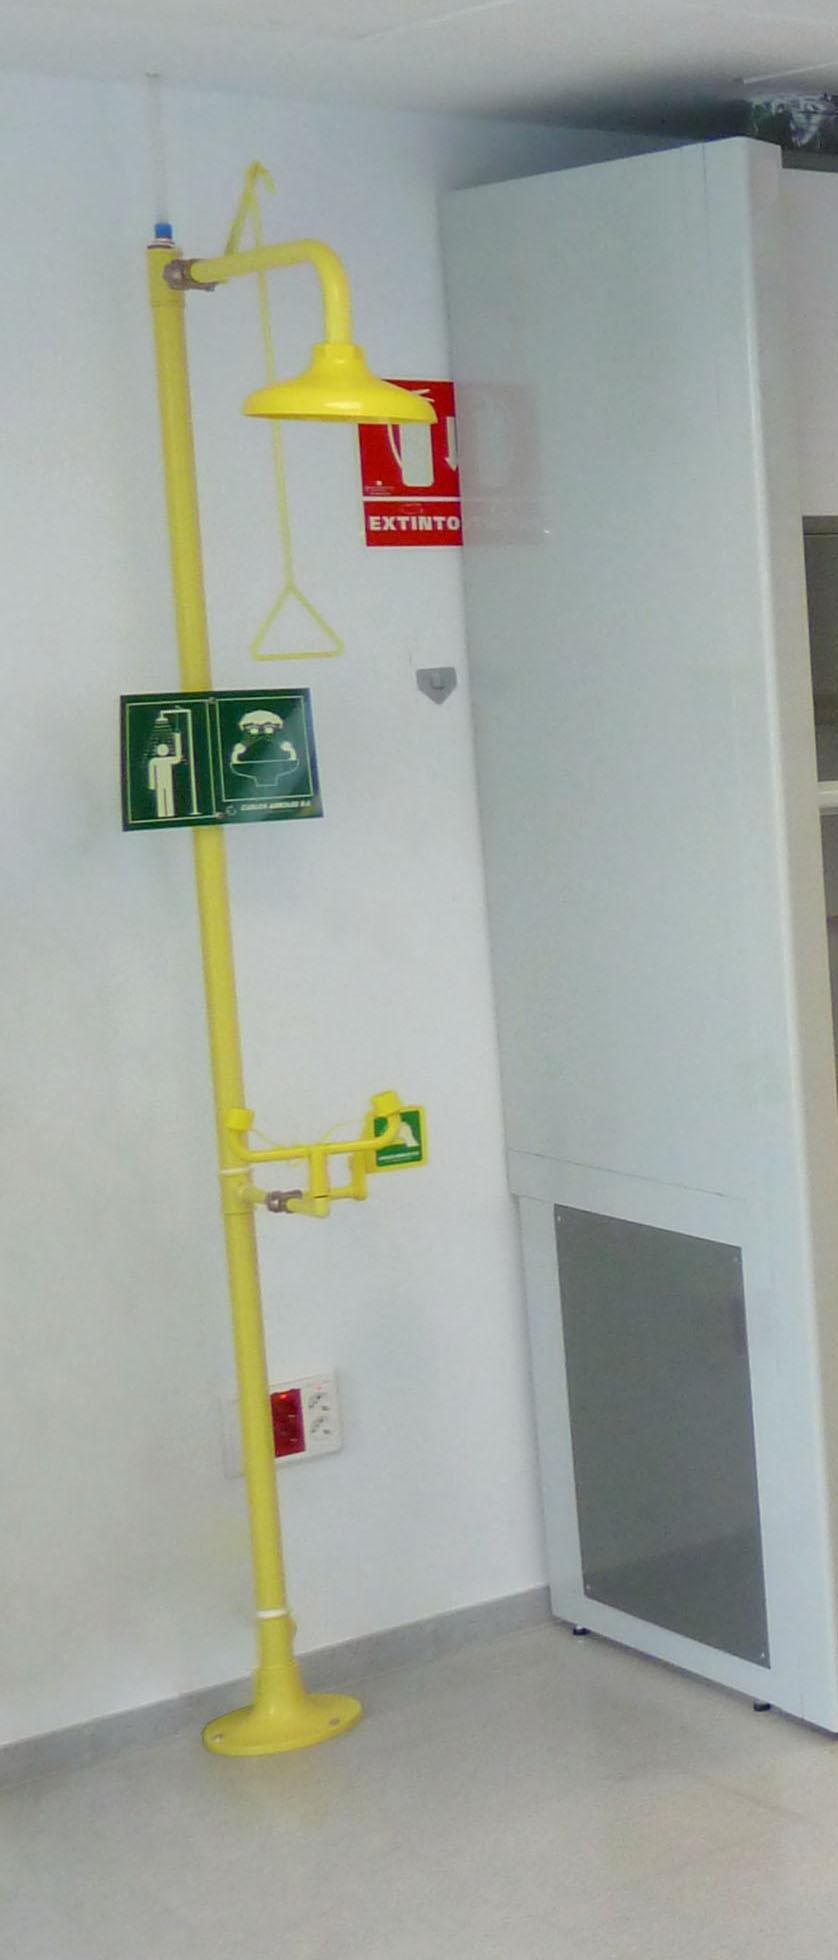 ducha-lavaojos-de-emergencia-e23